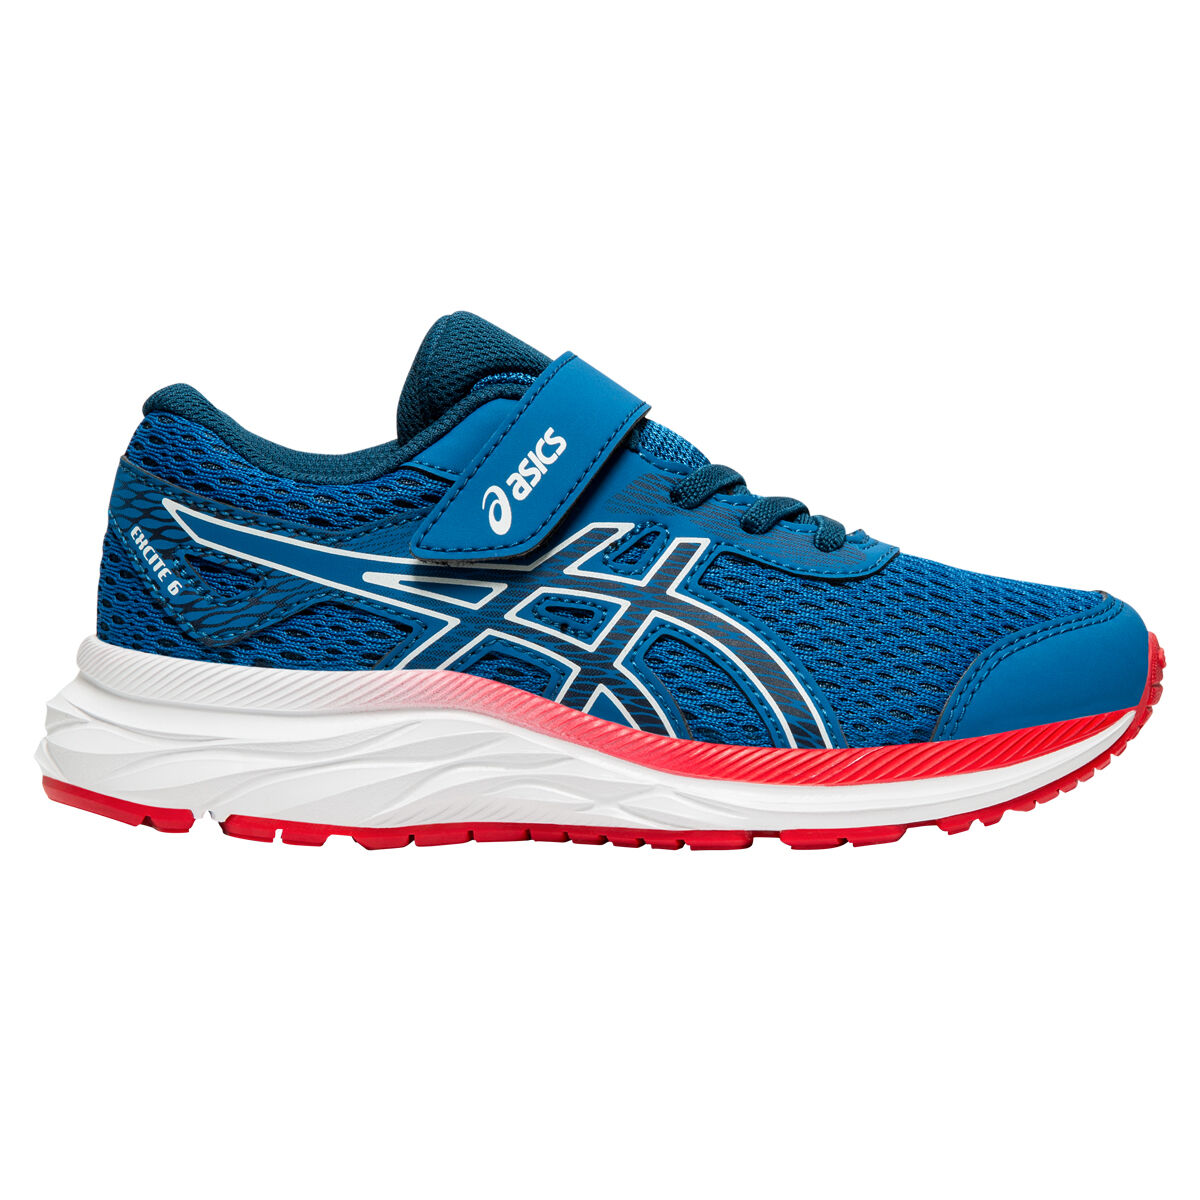 Asics GEL Excite 6 Kids Running Shoes